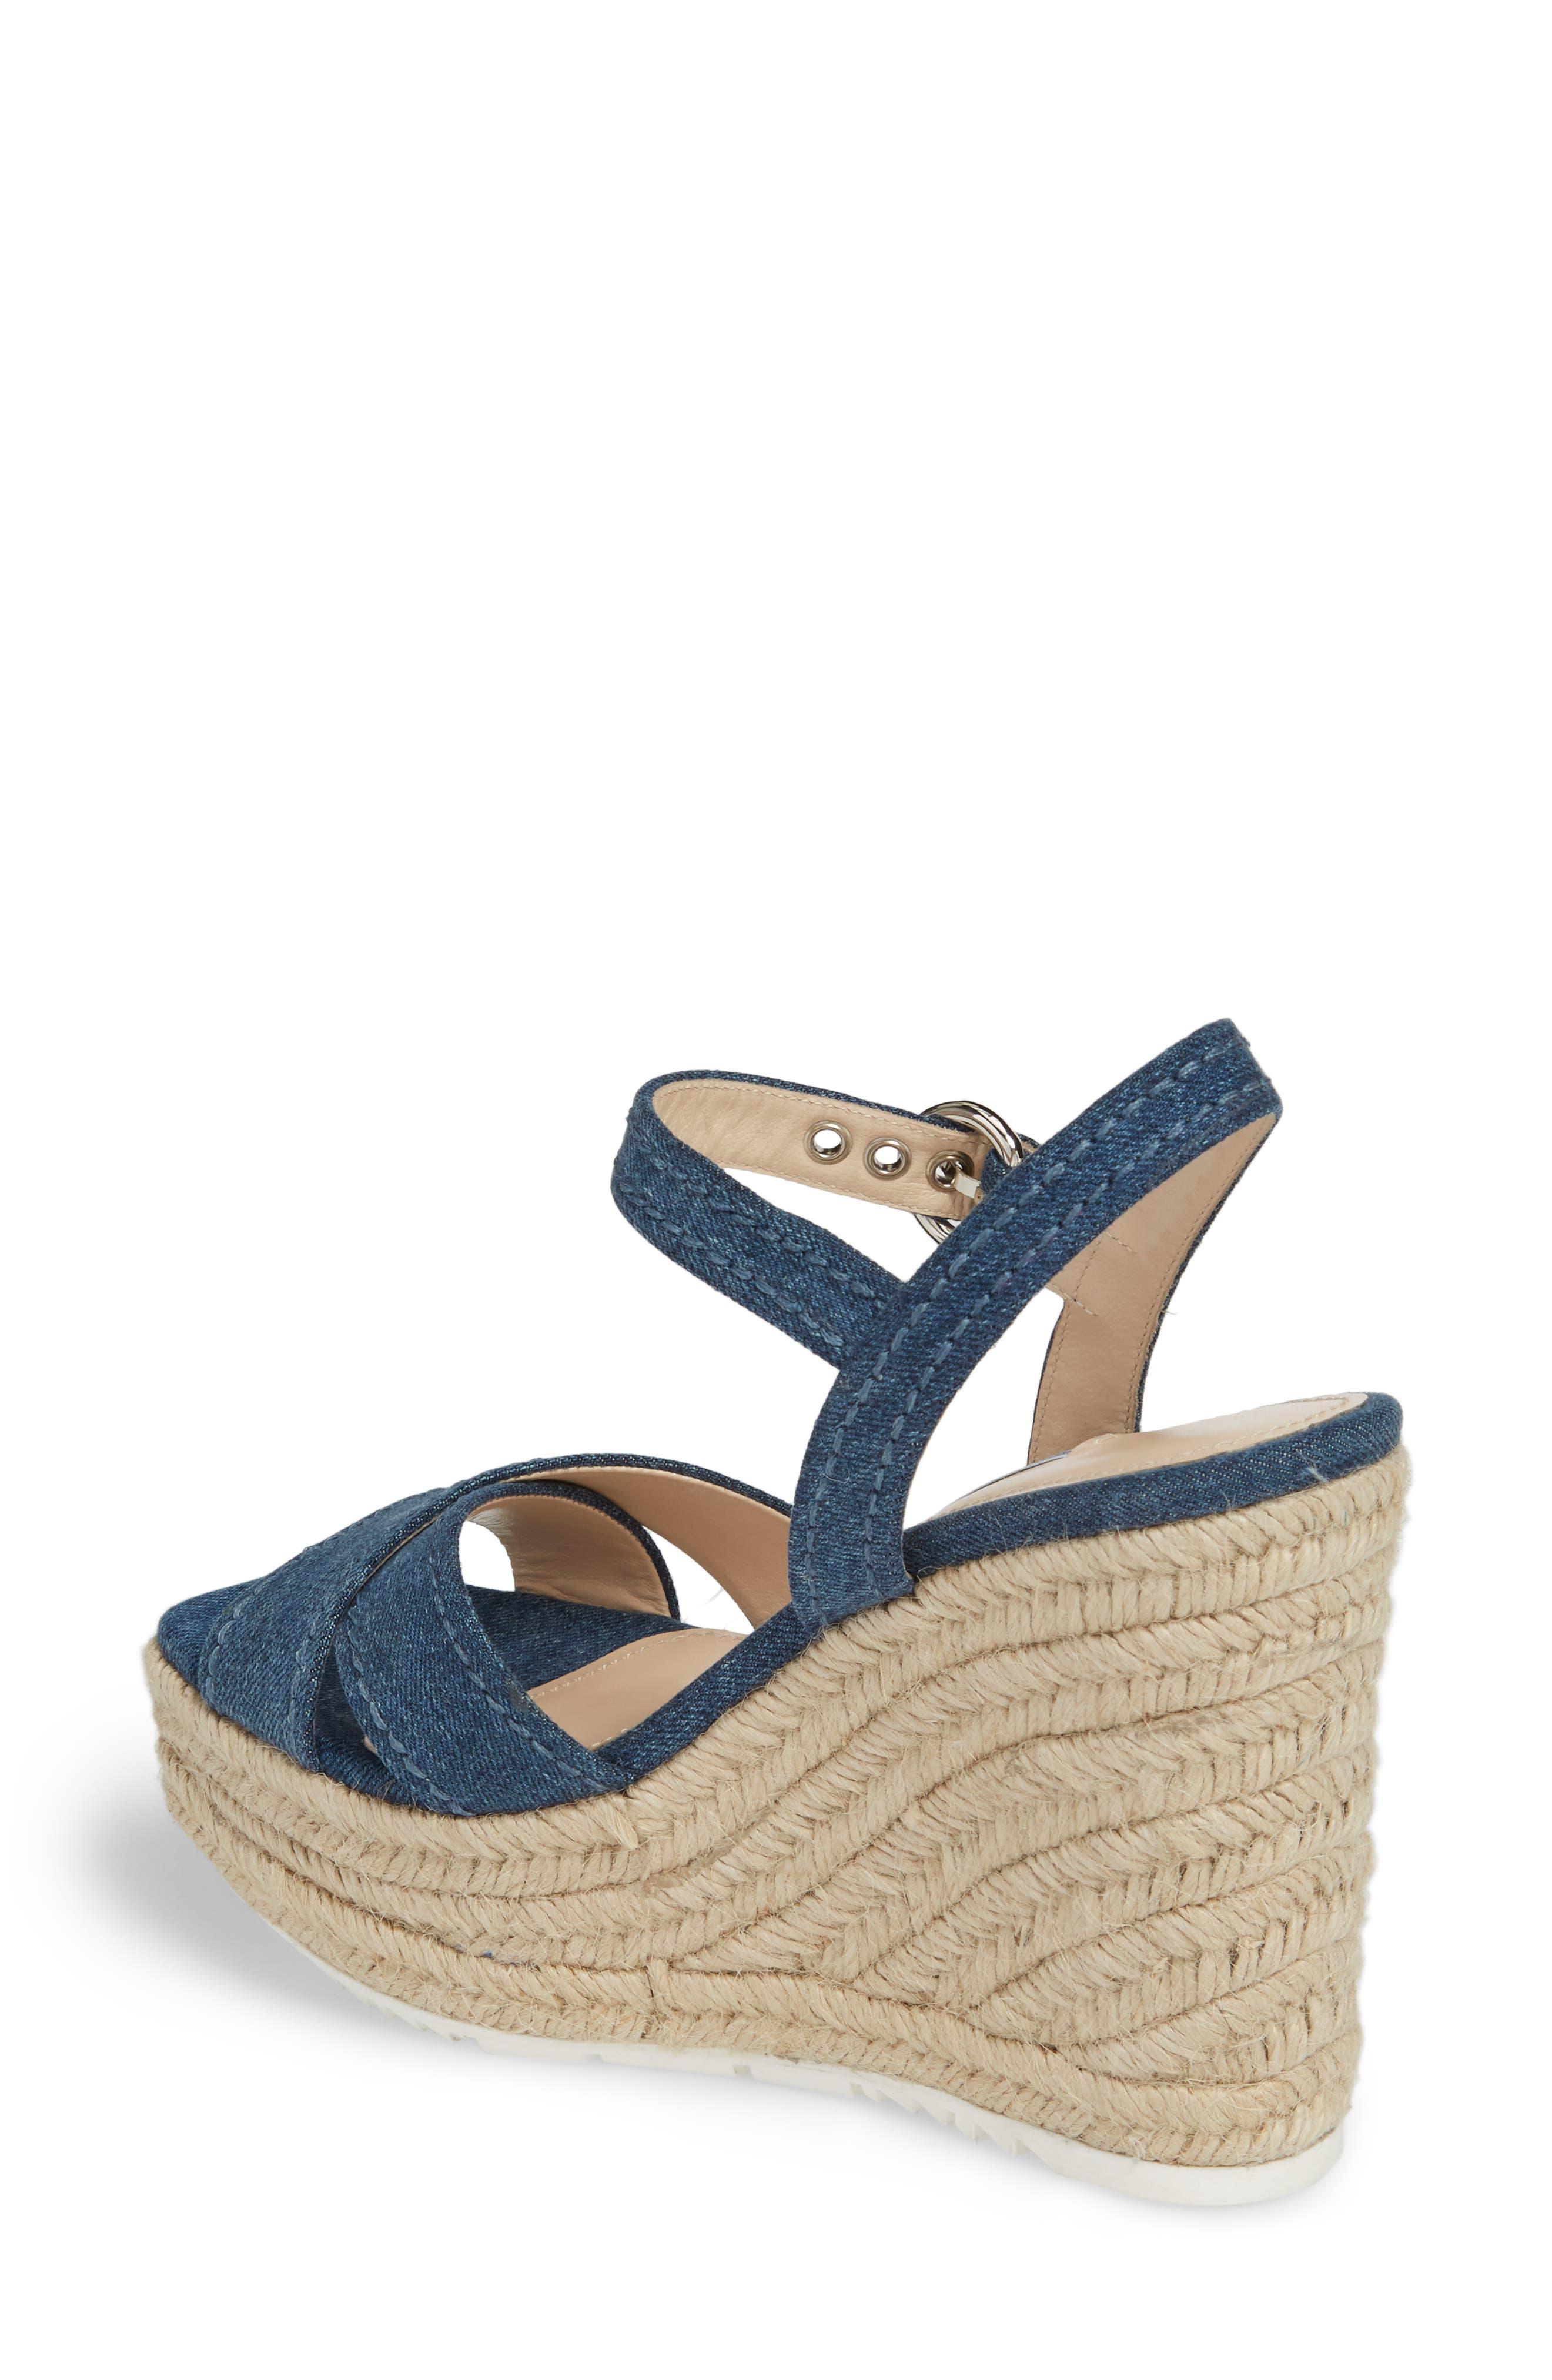 Espadrille Wedge Sandal,                             Alternate thumbnail 2, color,                             Blue